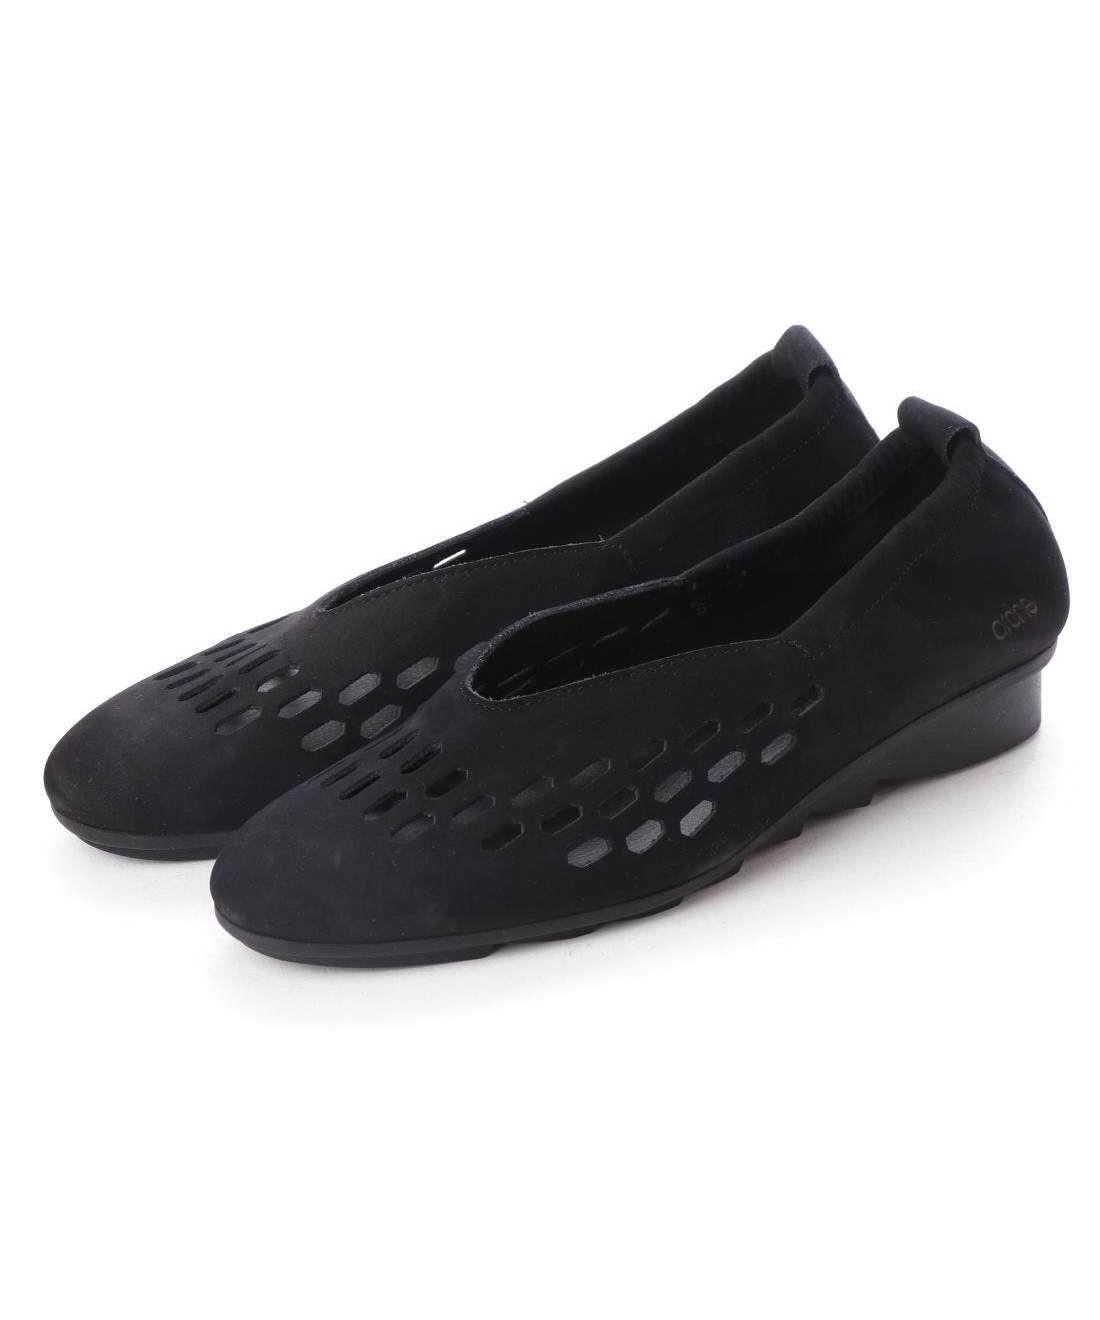 Arche Womens Shoe Model BIBIZA